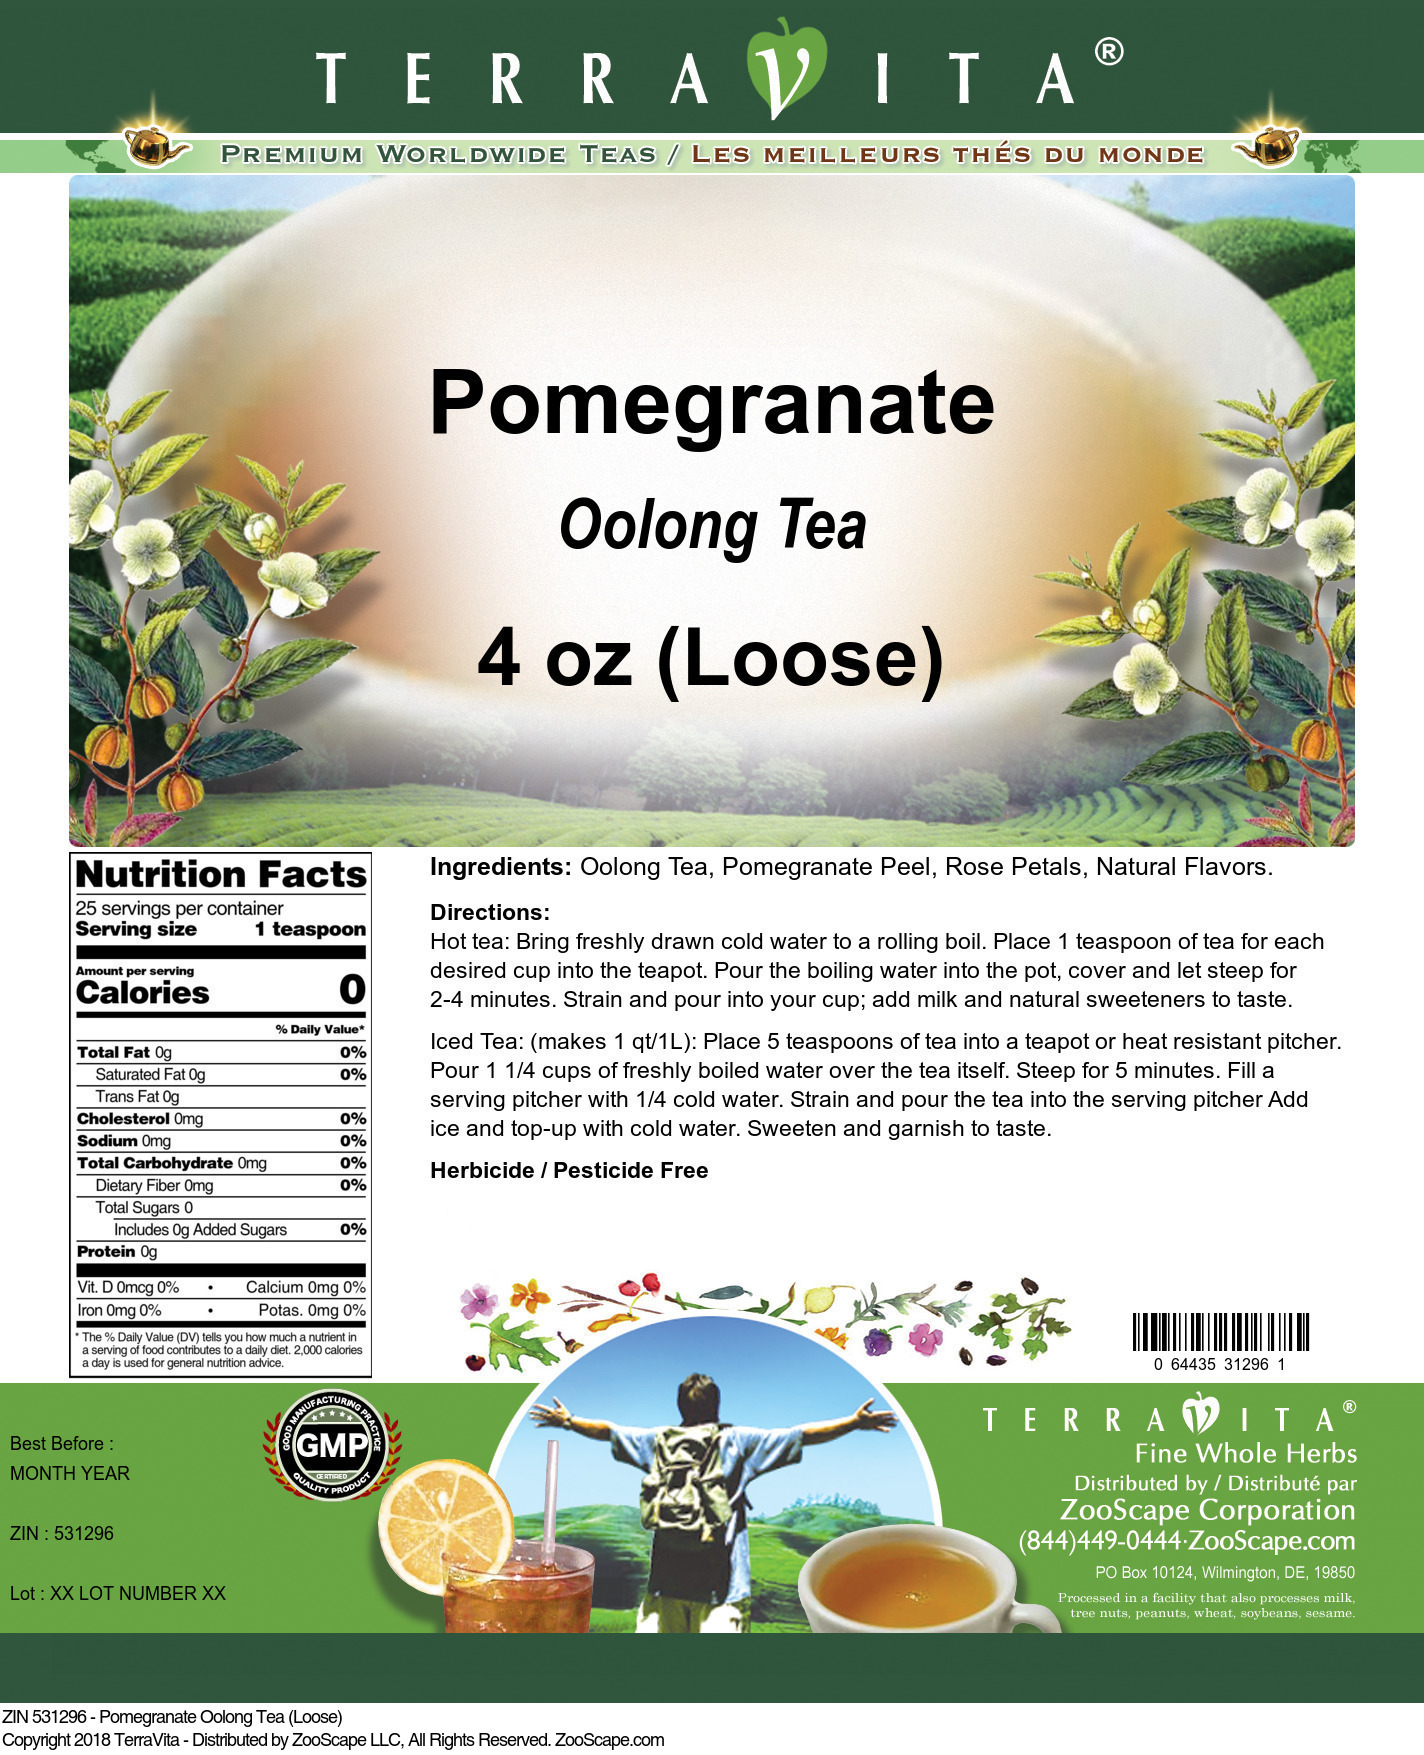 Pomegranate Oolong Tea (Loose)